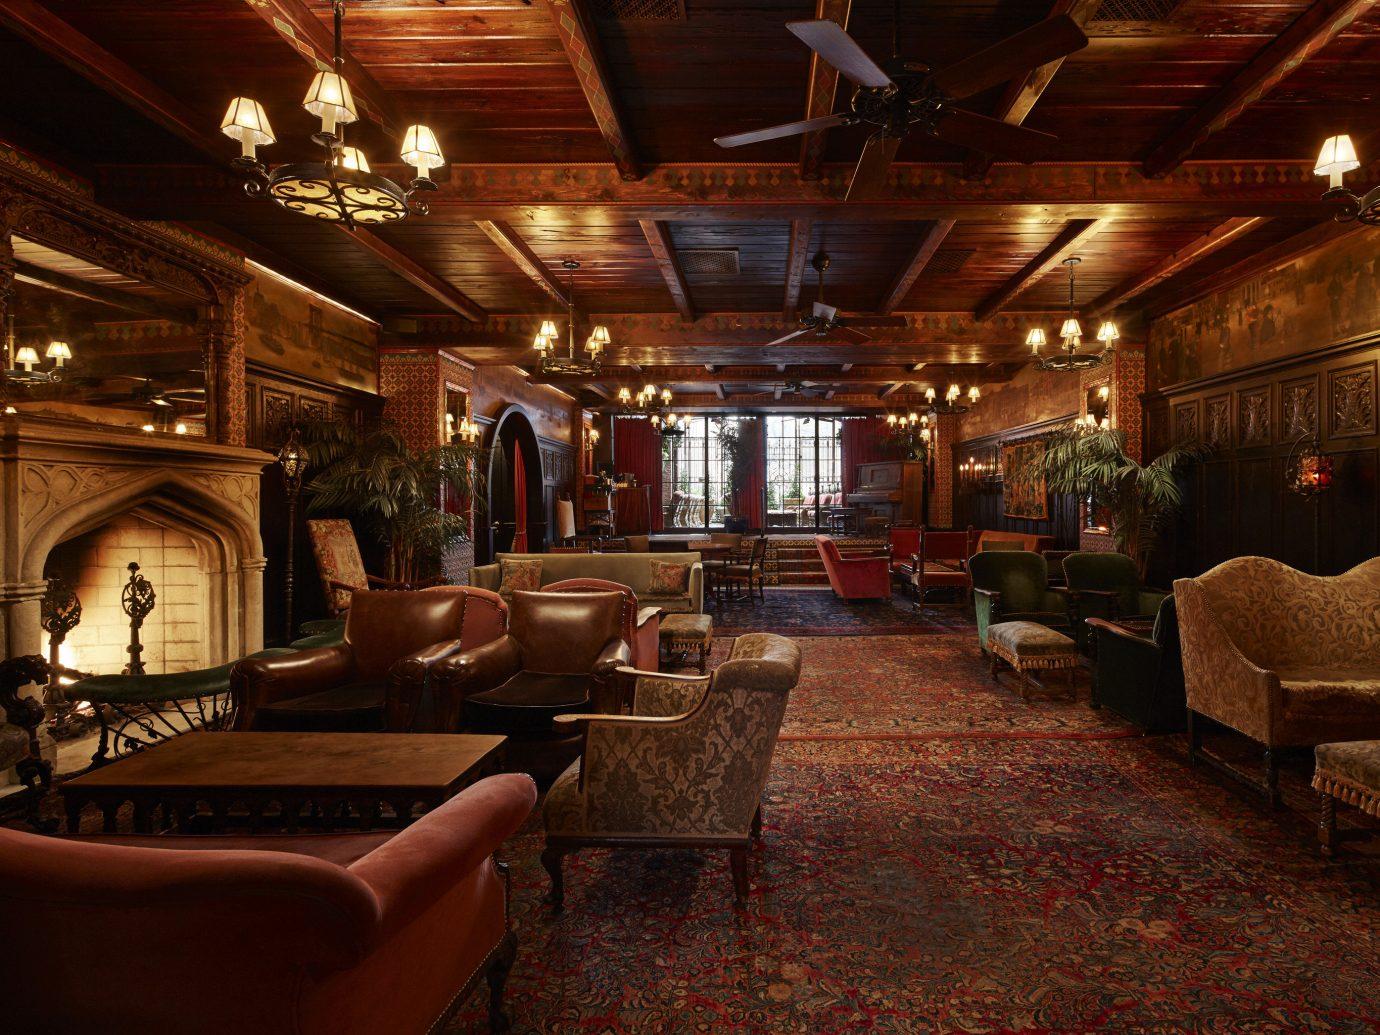 Celebs Hotels Trip Ideas indoor floor room ceiling interior design Lobby lighting living room home estate tavern furniture